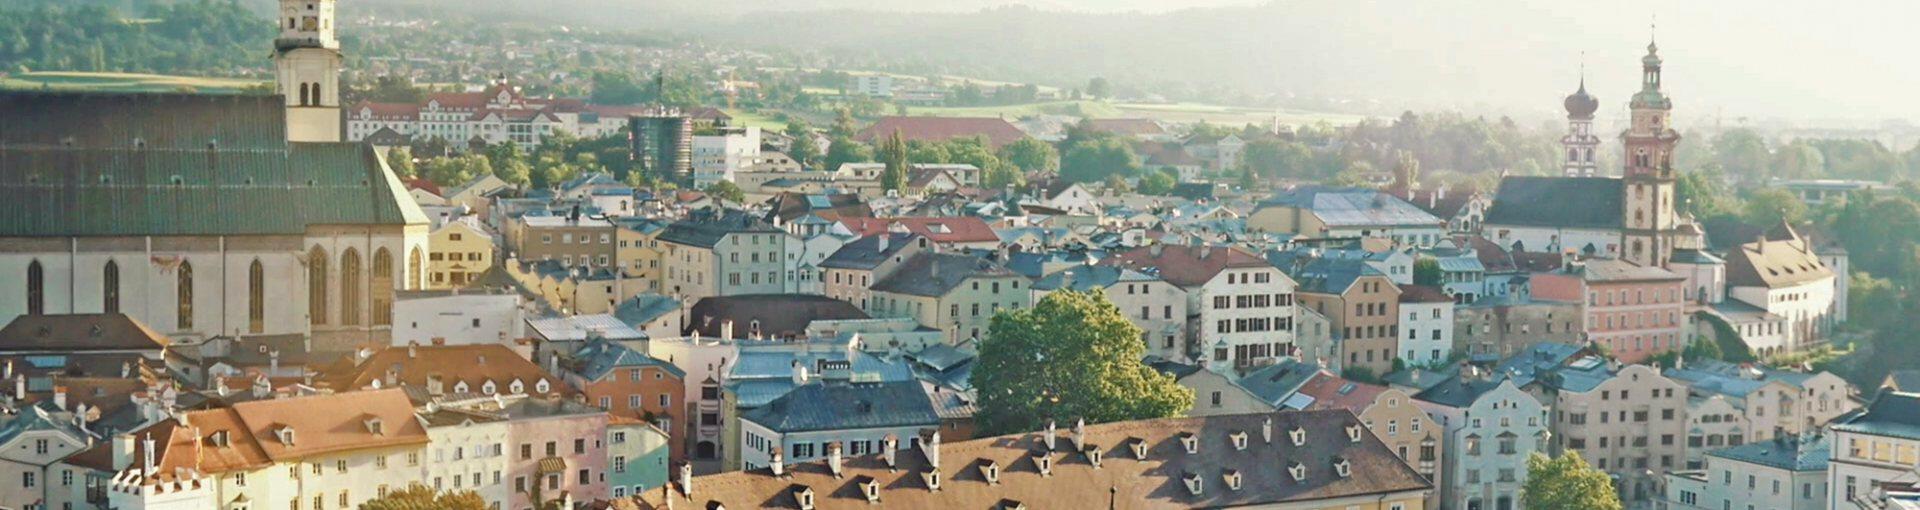 Altstadt Hall- Region Hall-Wattens